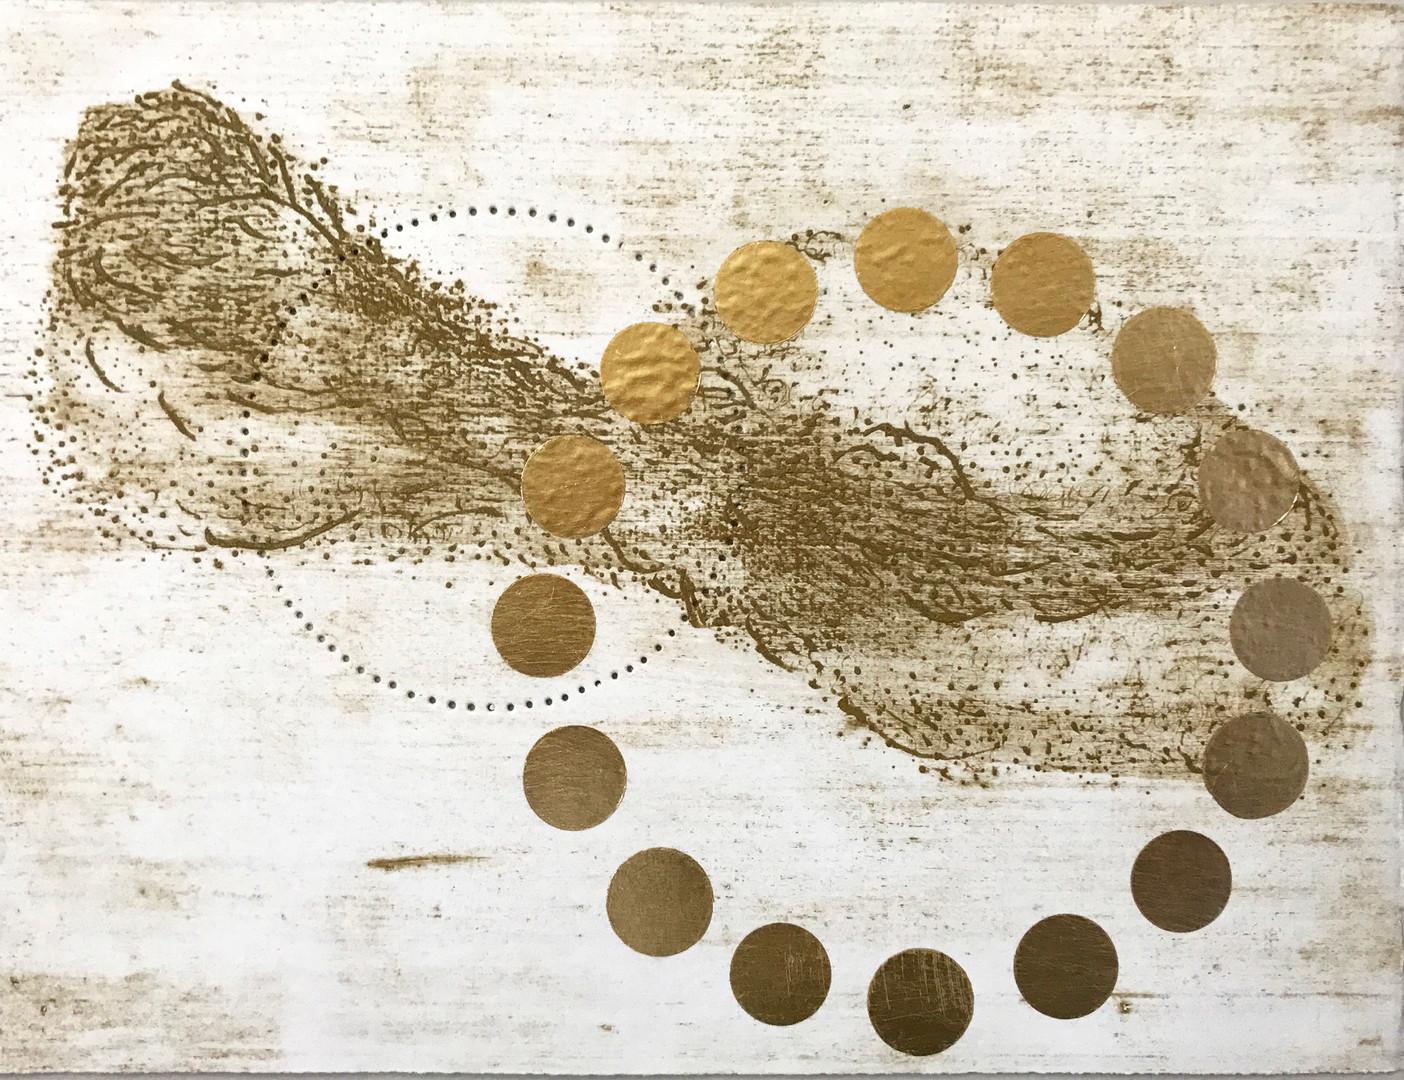 Jen Craun - murmuration movement